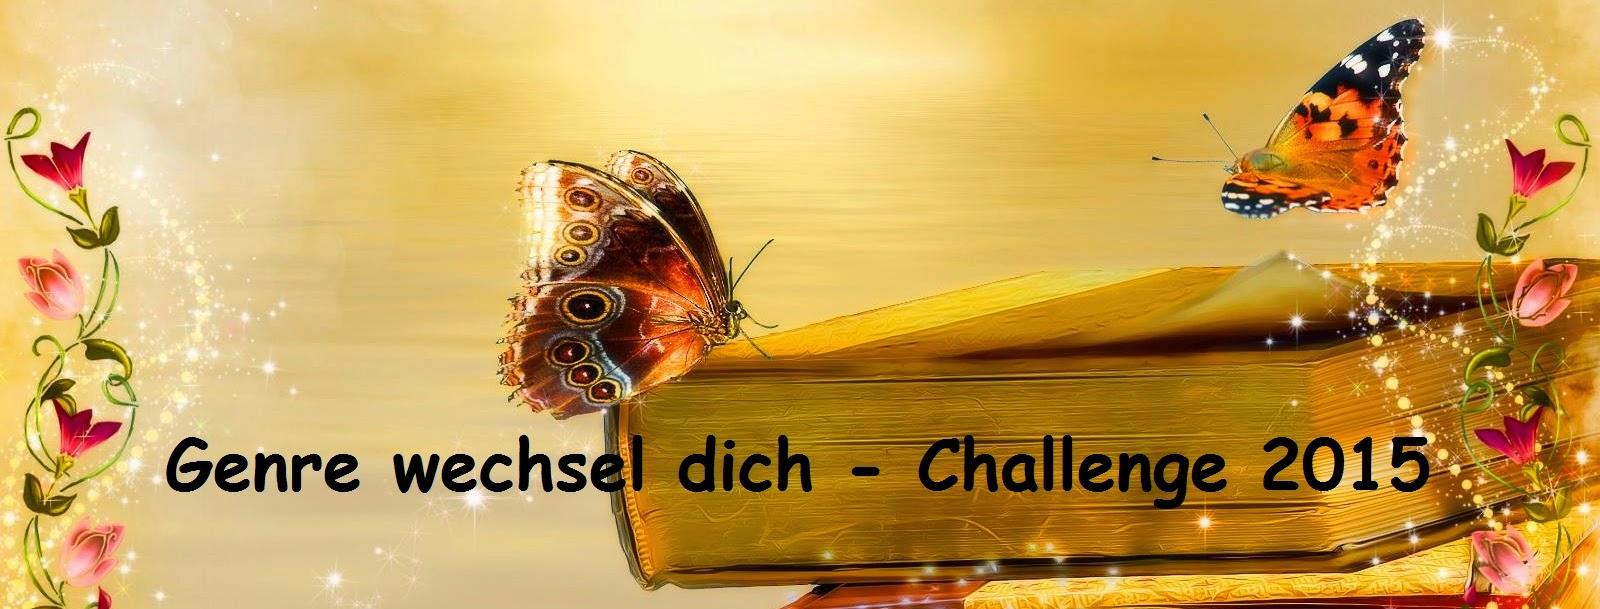 http://blaueblaubeere.blogspot.de/p/genre-wechsel-dich.html